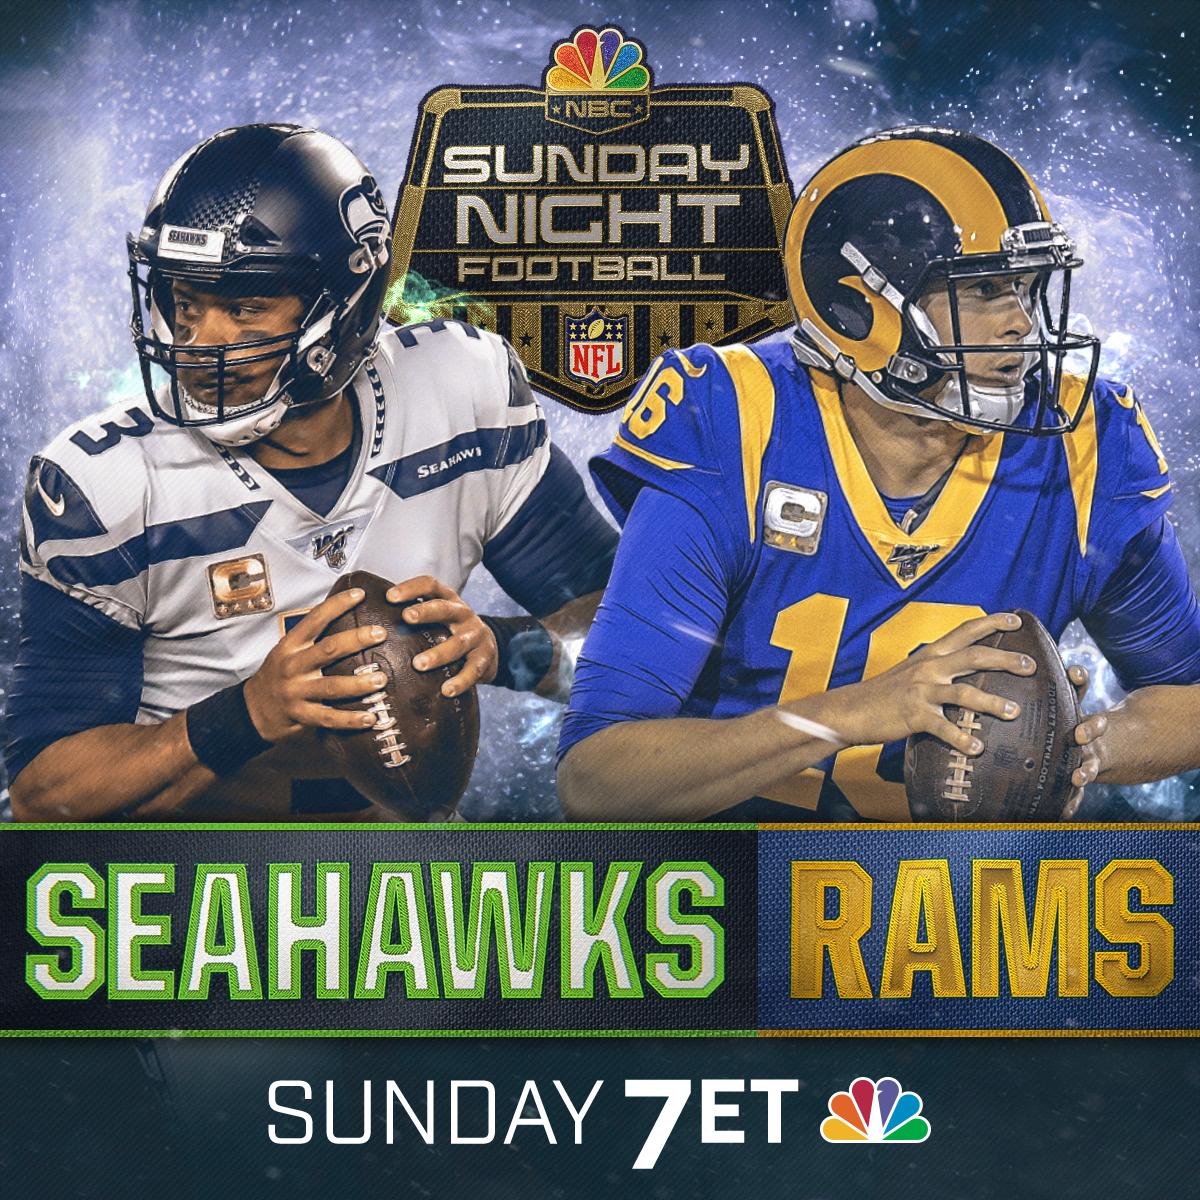 Watch Live Sunday Night Football Seahawks Vs Rams Wwlp